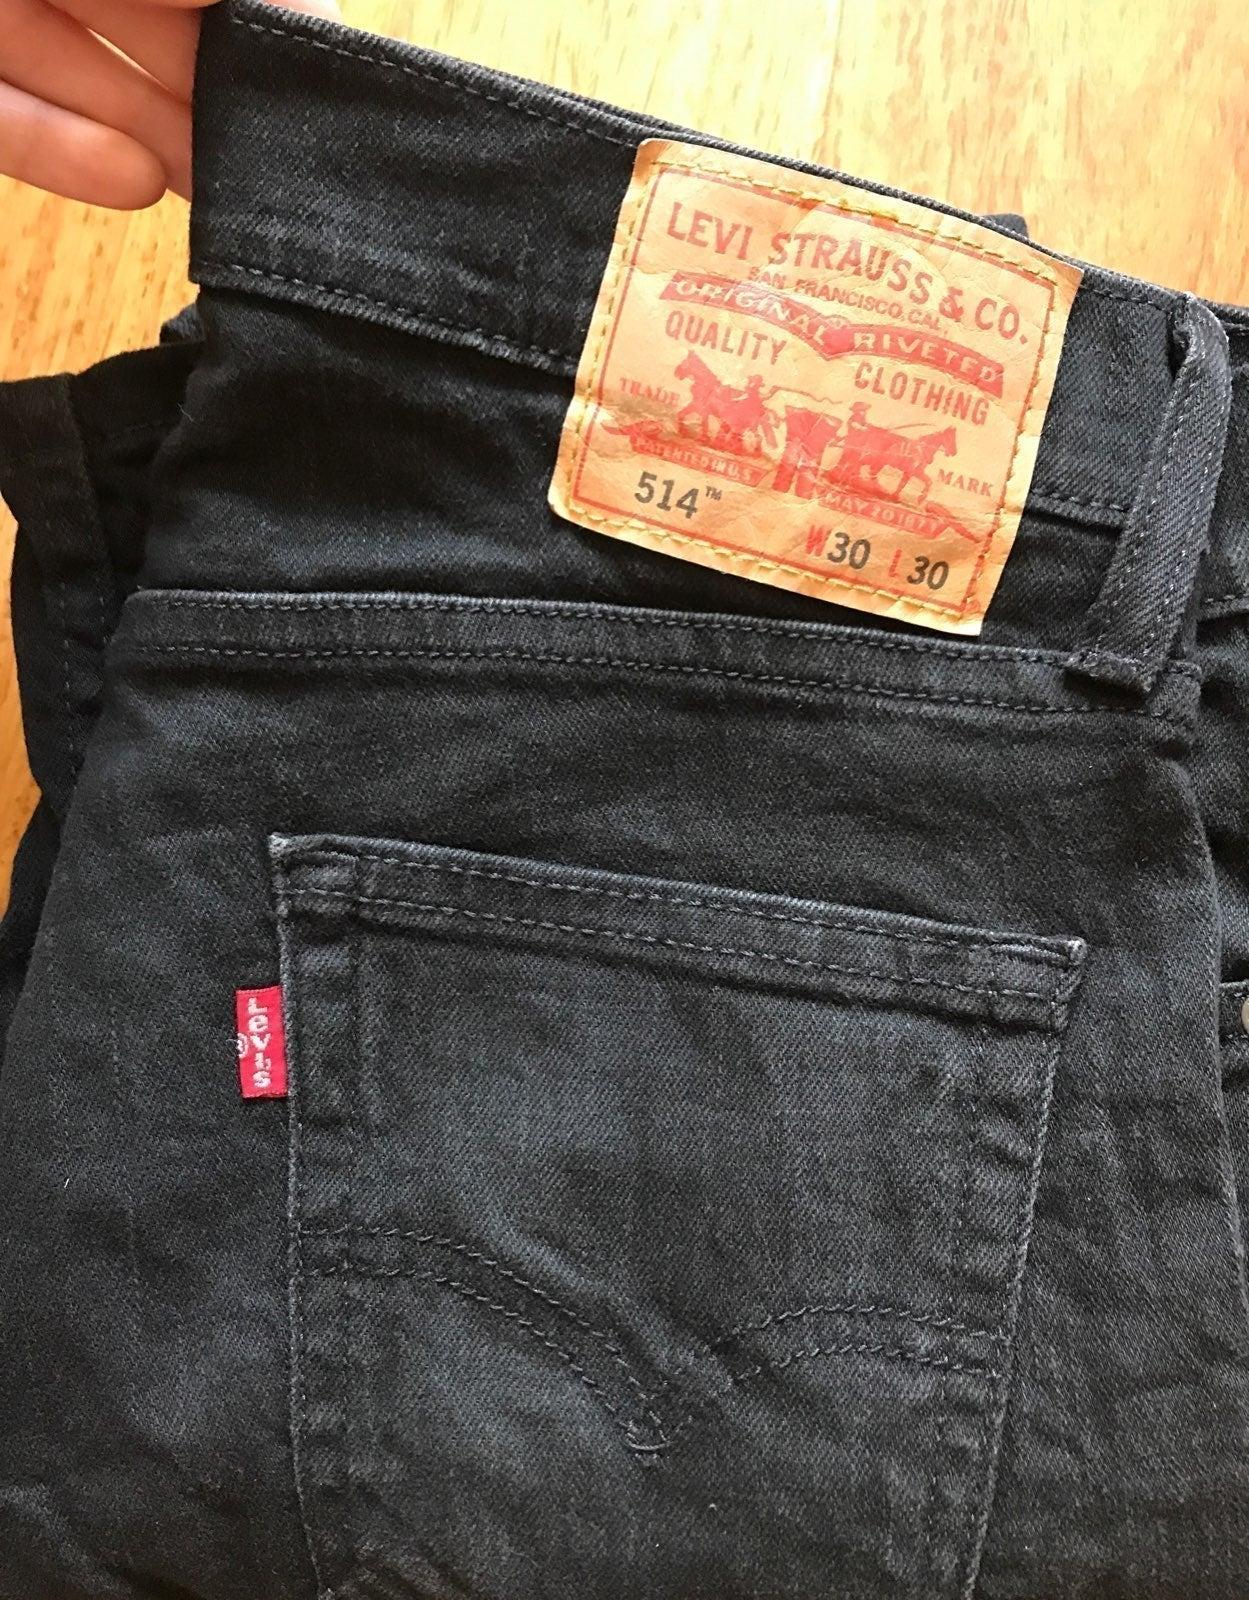 Levi's 514 Black Jeans